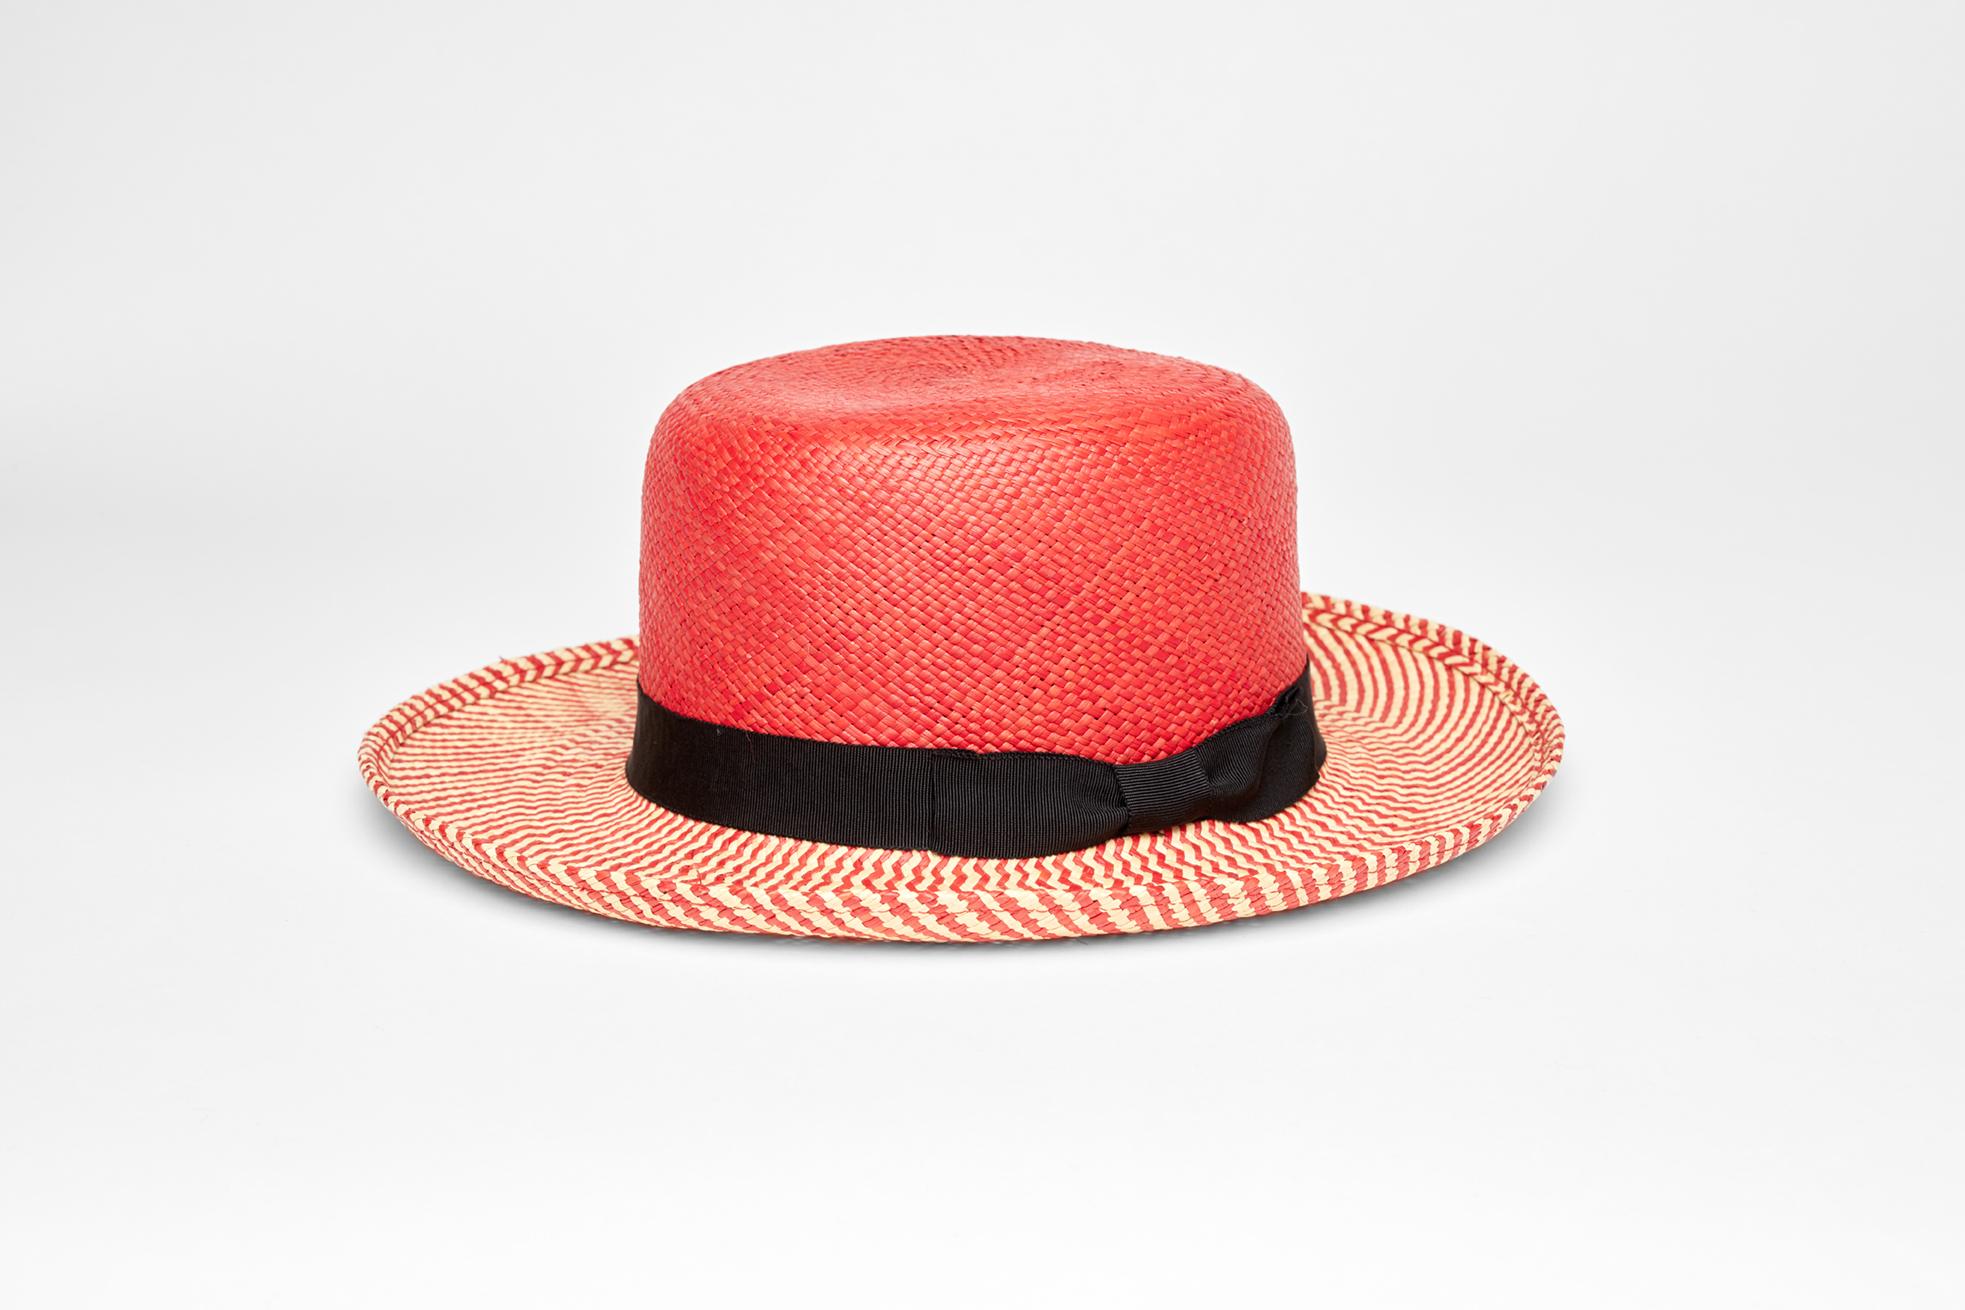 d1171f36340 Anthony Peto – Hobo in red zig zag Panama – €170